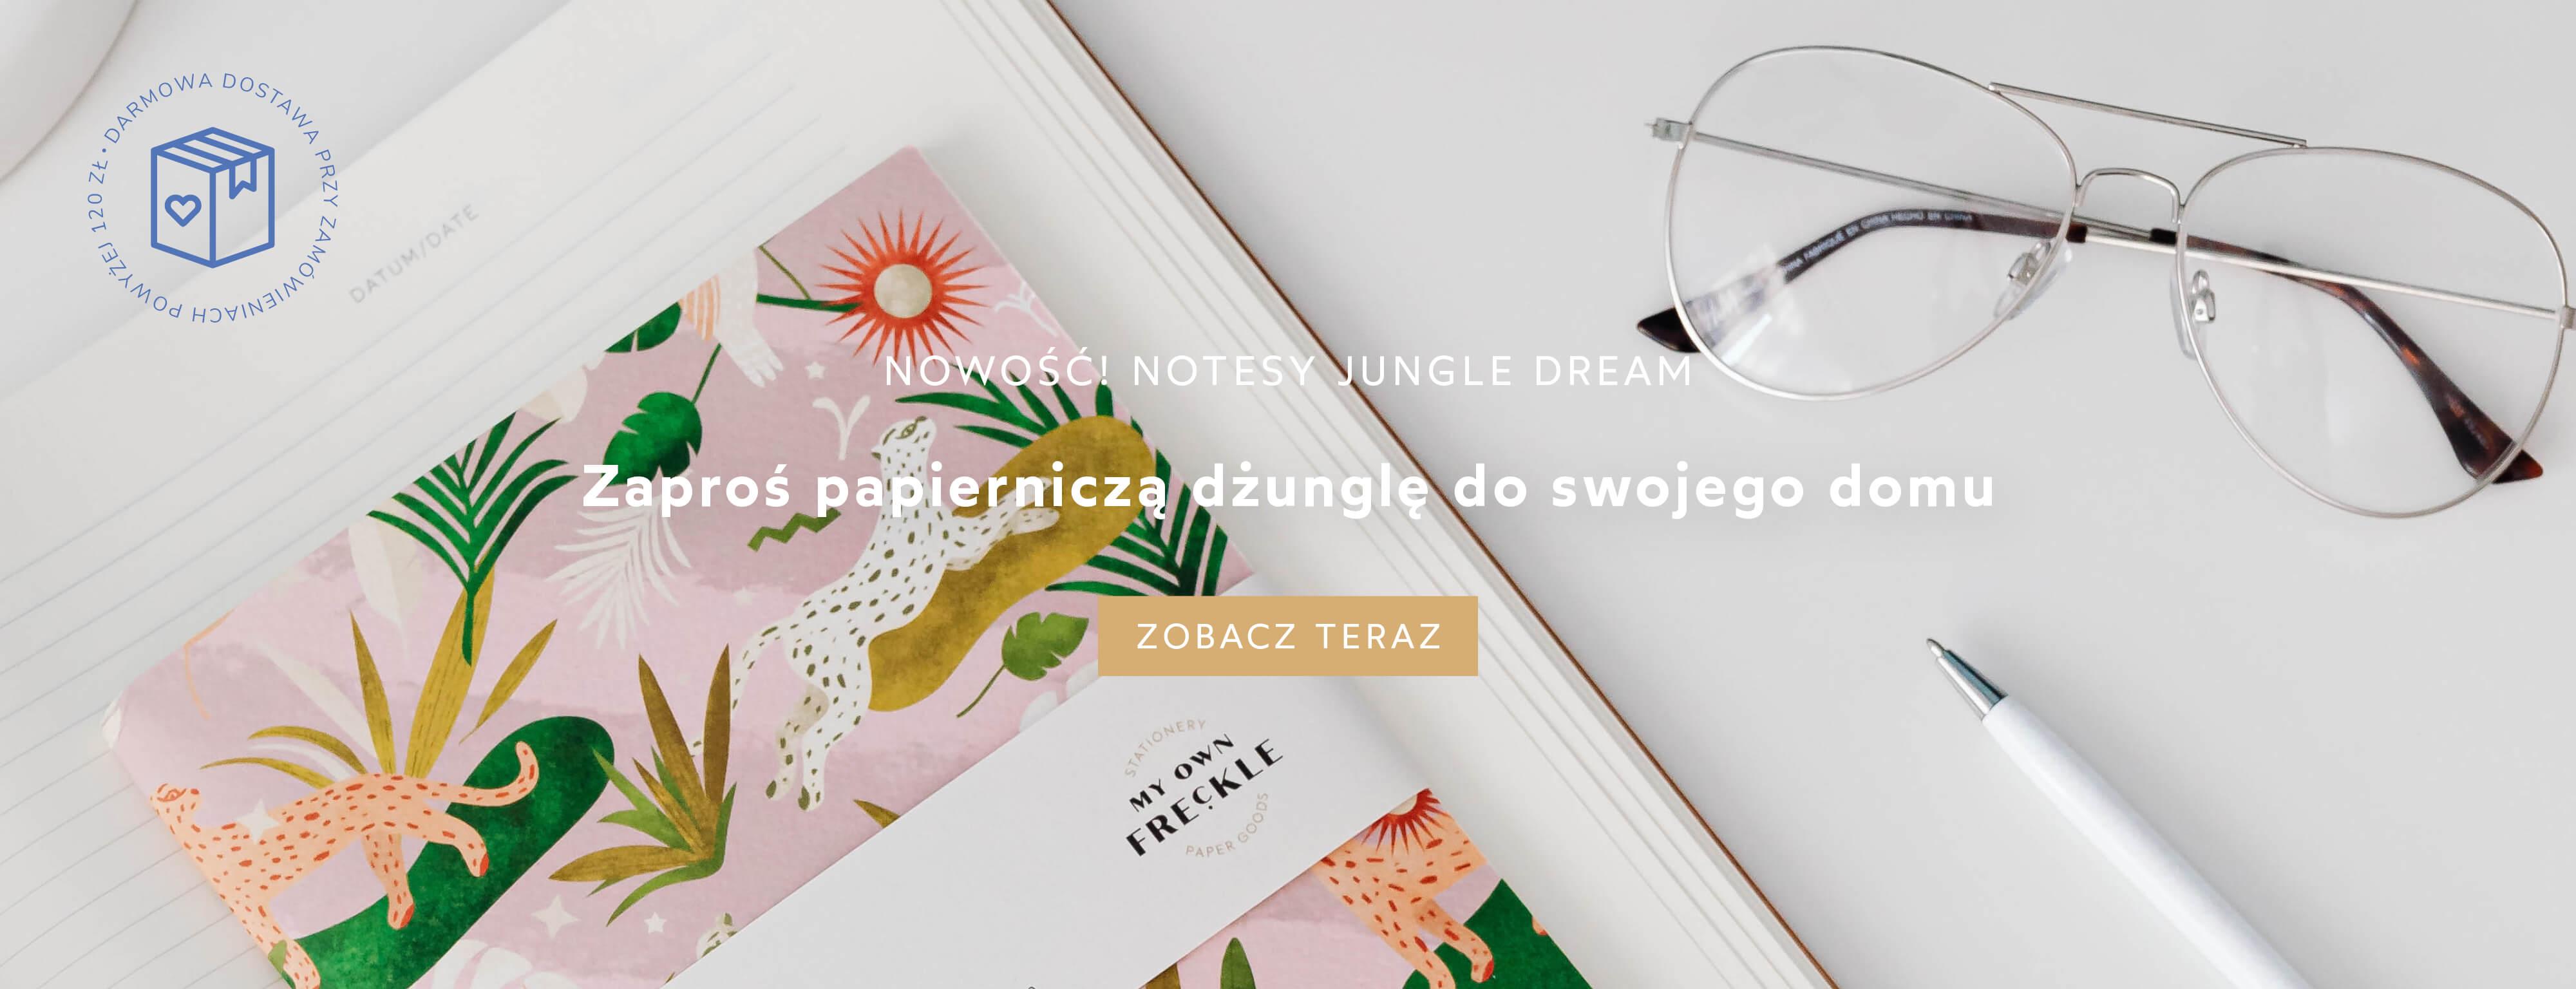 dream jungle notes